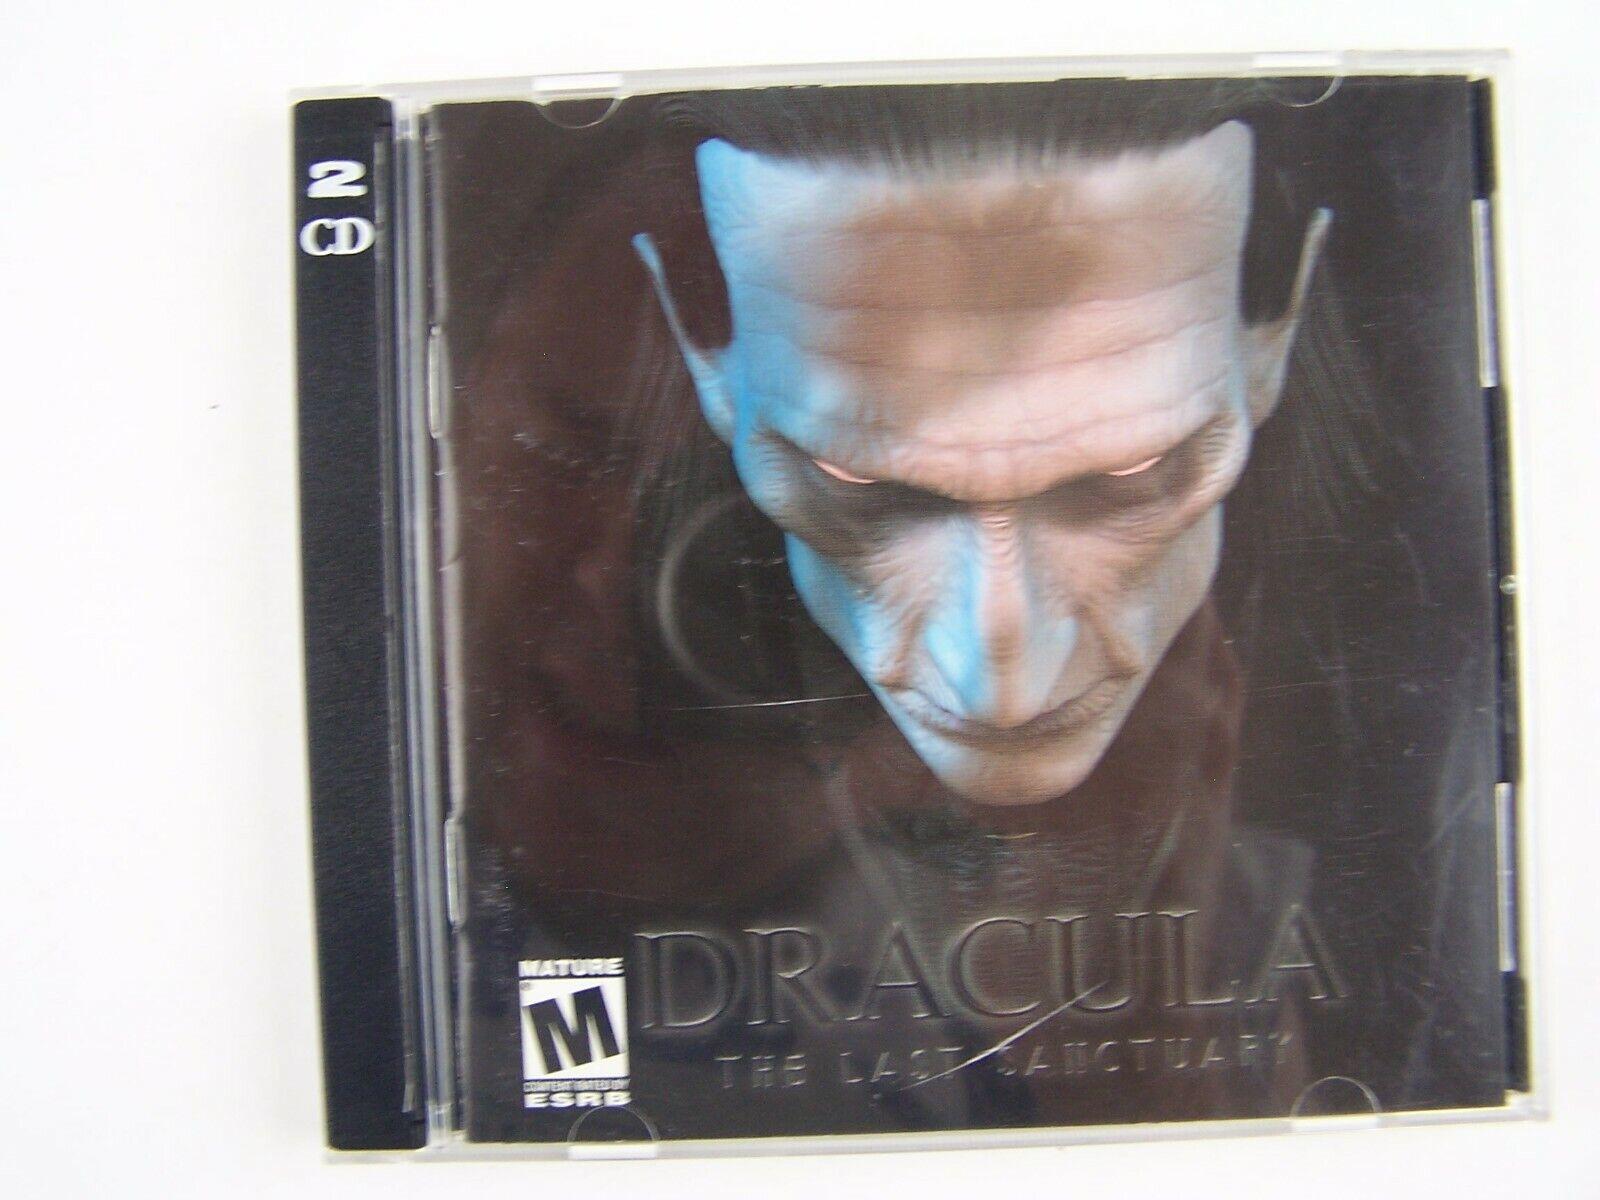 Dracula: The Last Sanctuary PC CD Software 625904302106